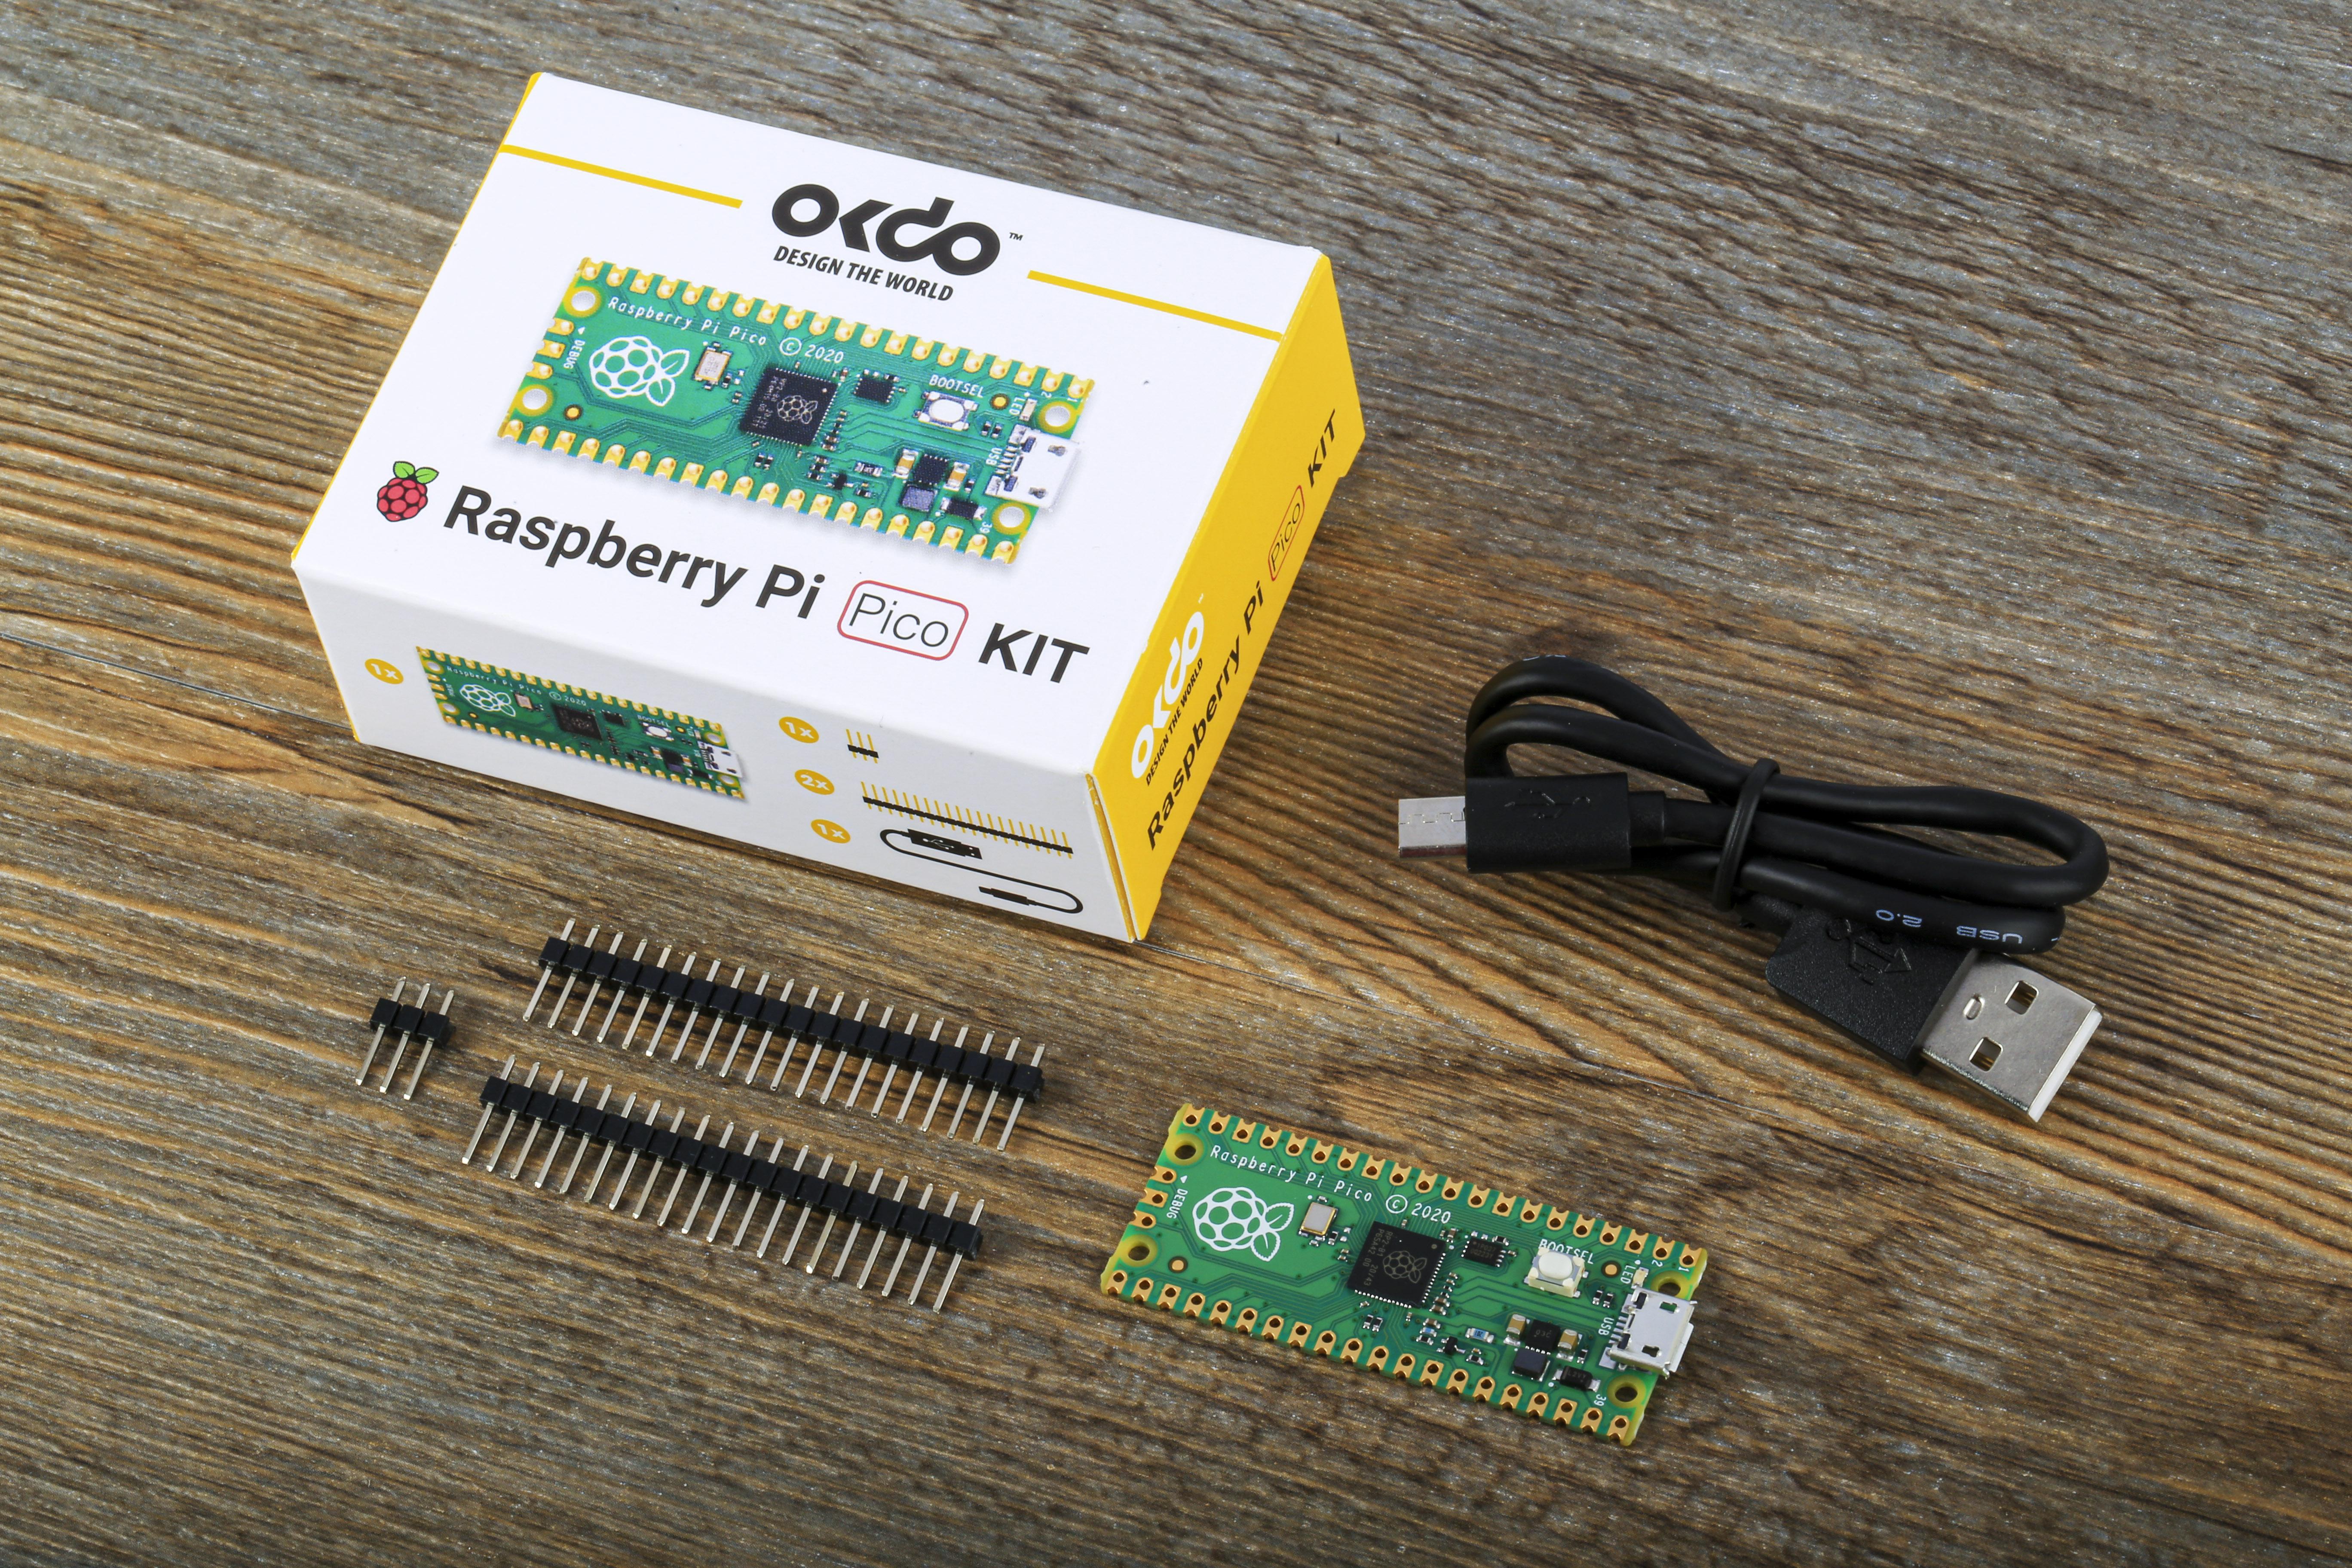 OKdo Raspberry Pi Pico Kit